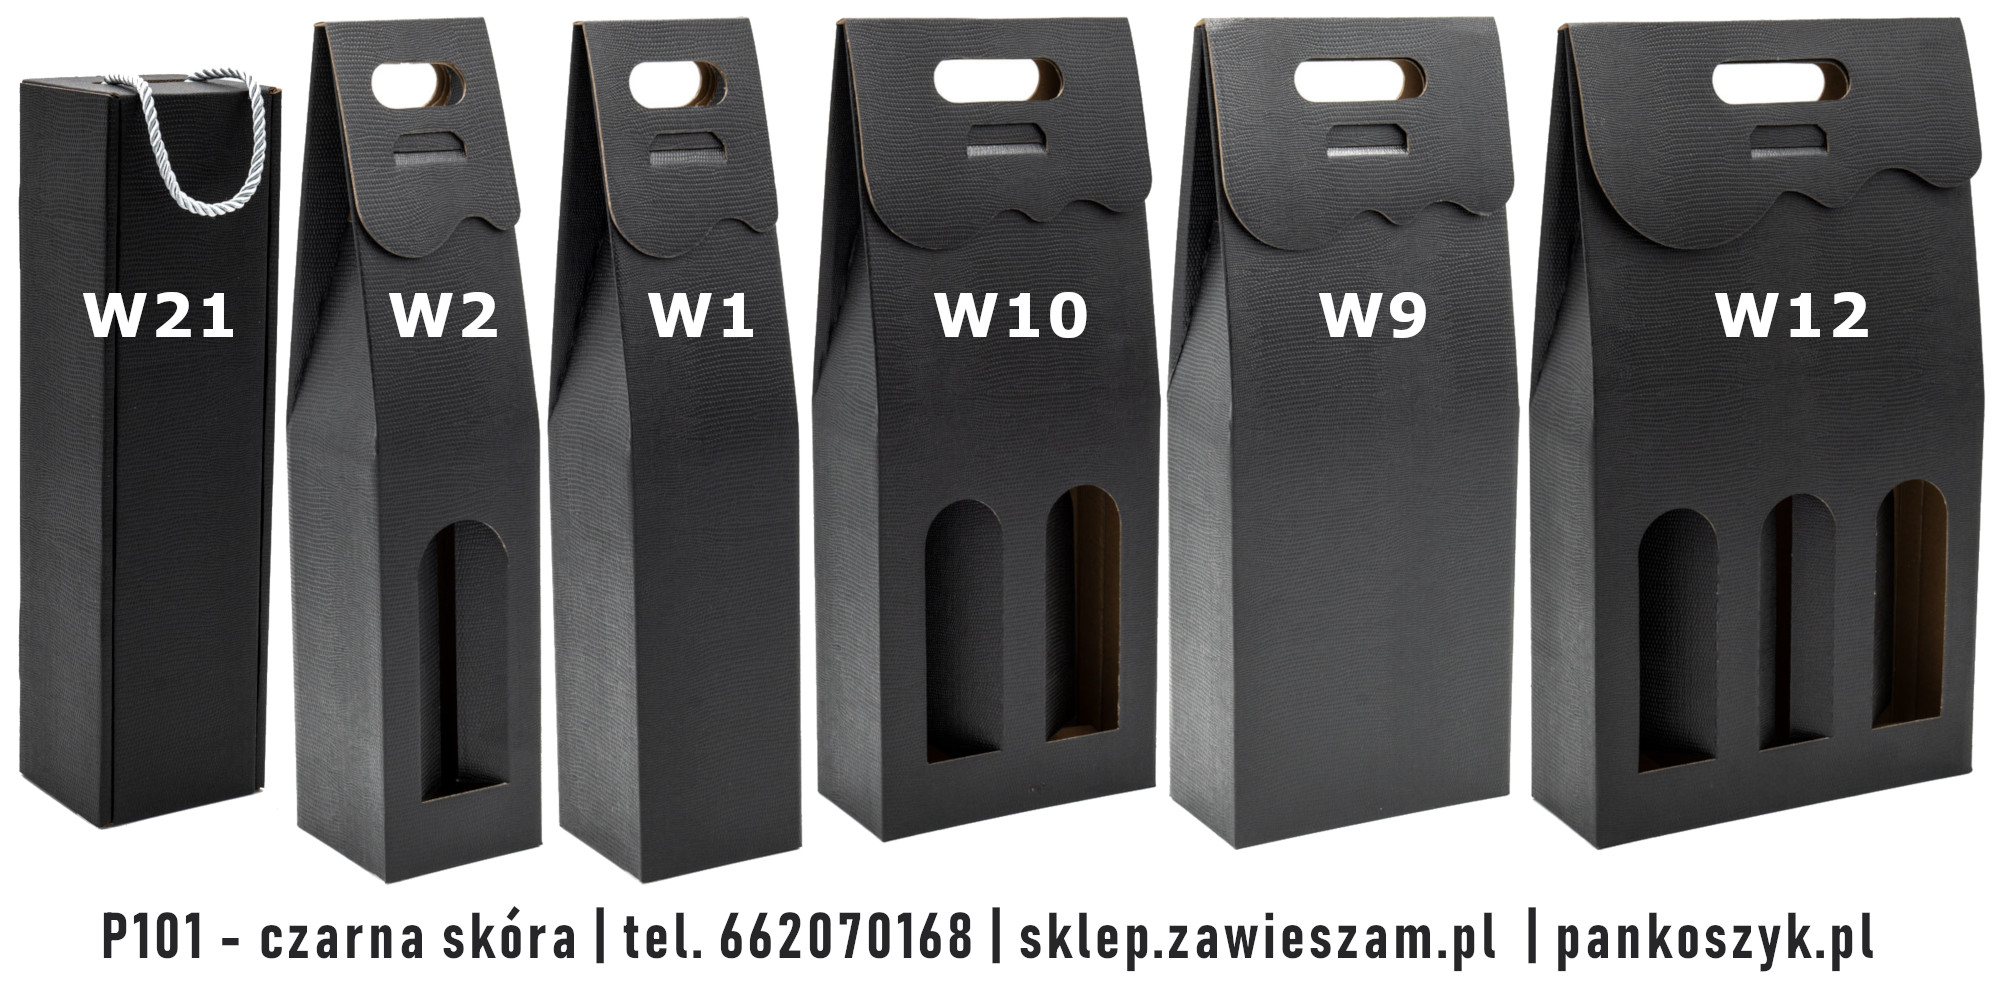 Kolorowe pudełko na butelki P110 - czarna skóra